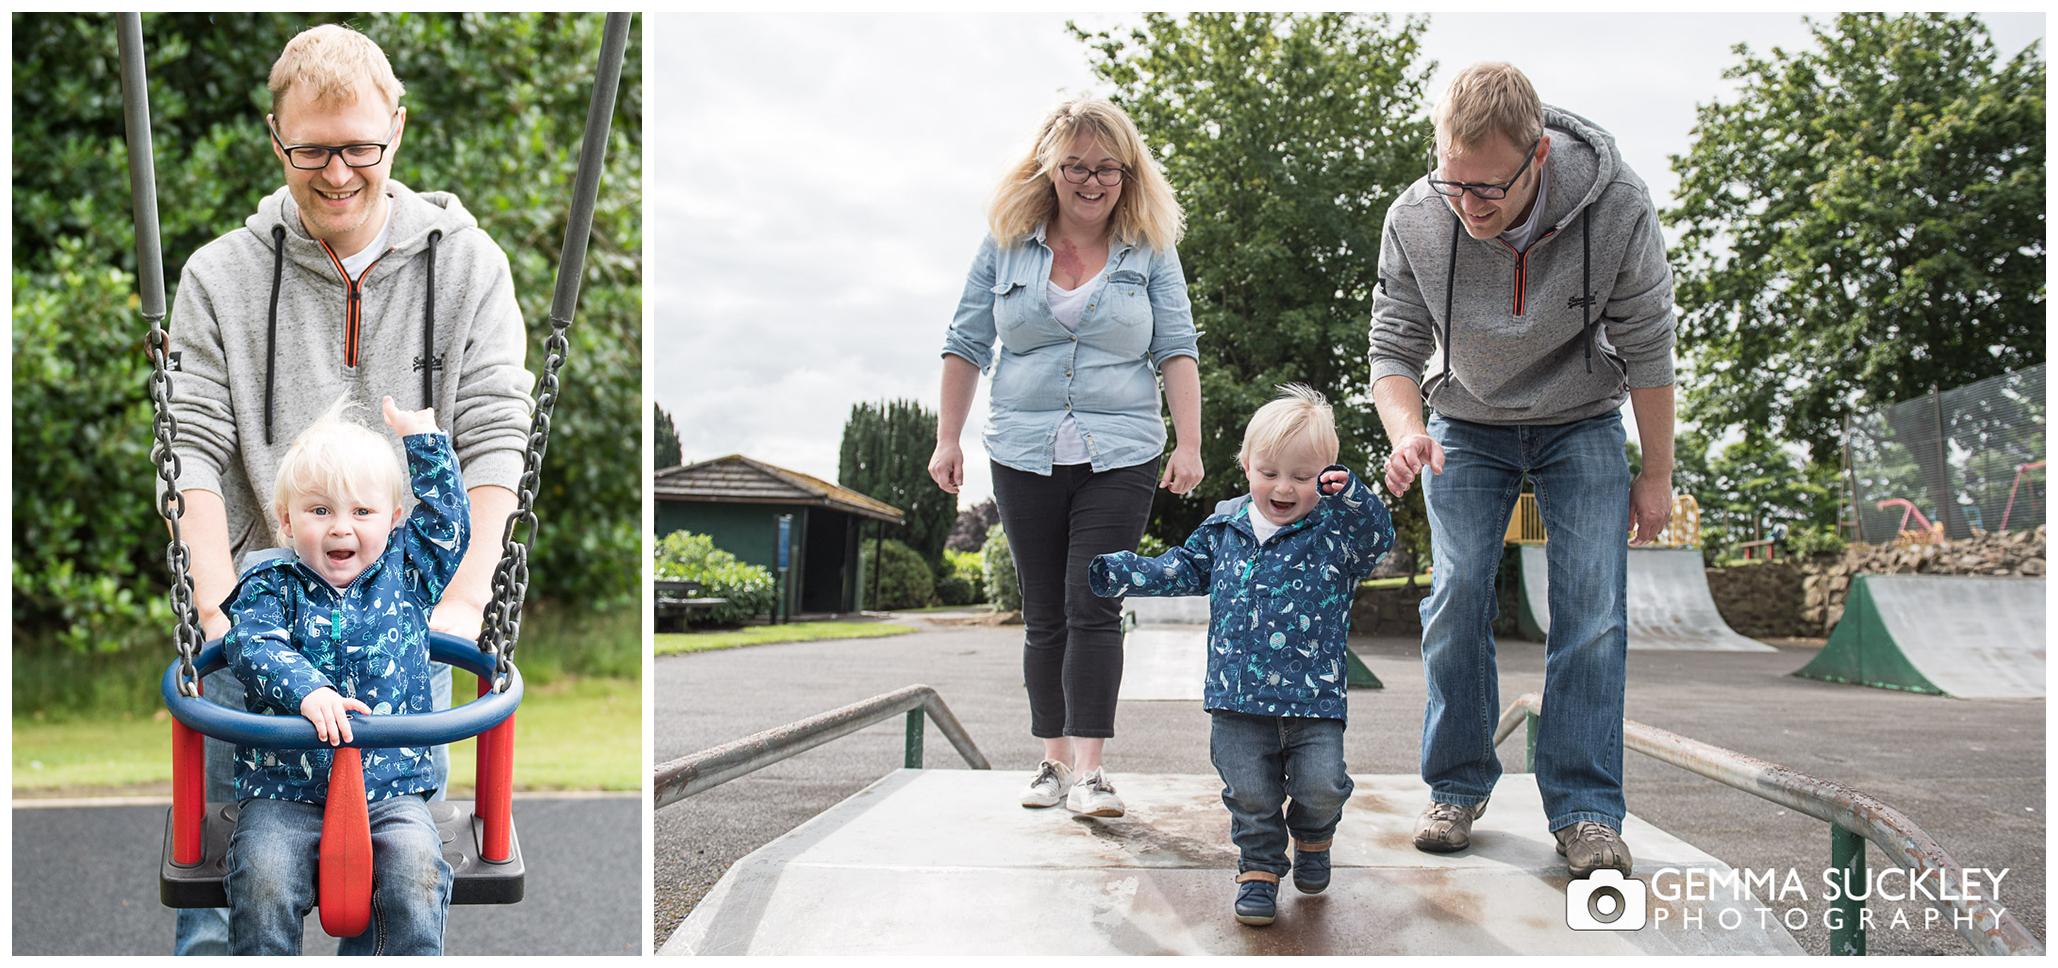 family in Glusburn Park during a photo shoot